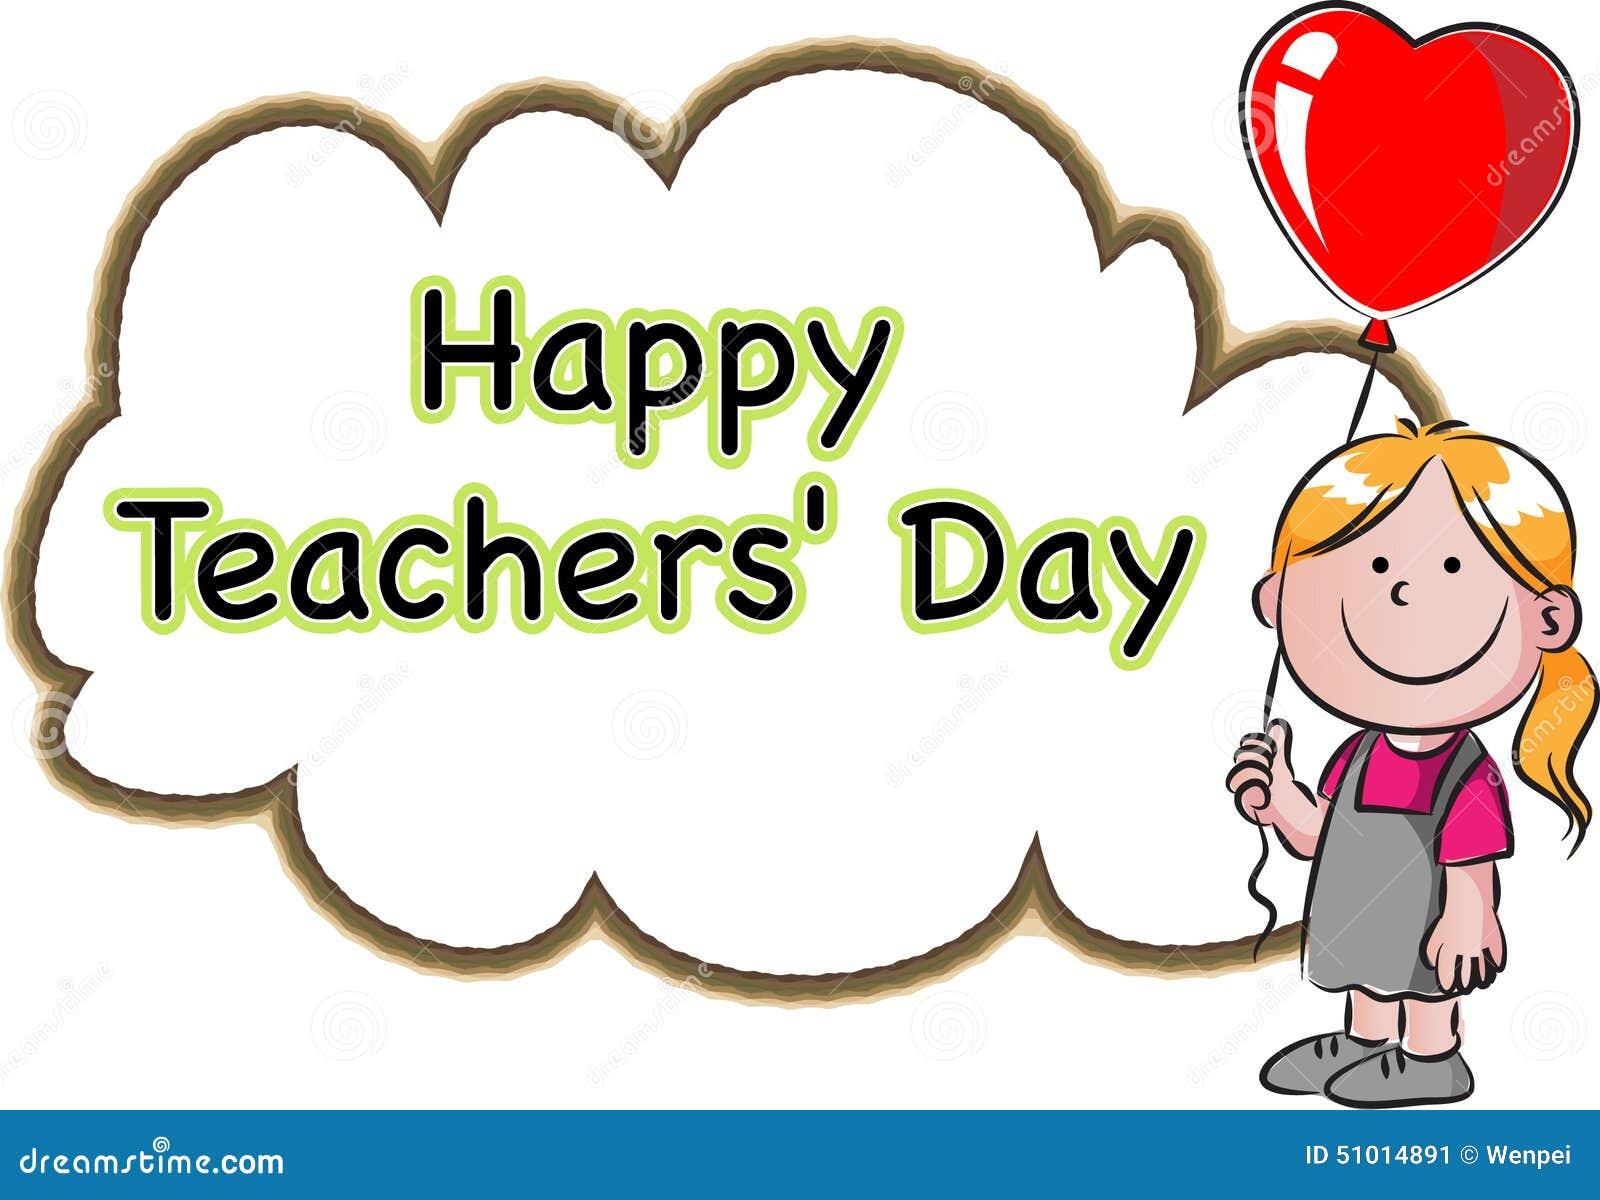 Happy Teachers Day Stock Illustration Image 51014891